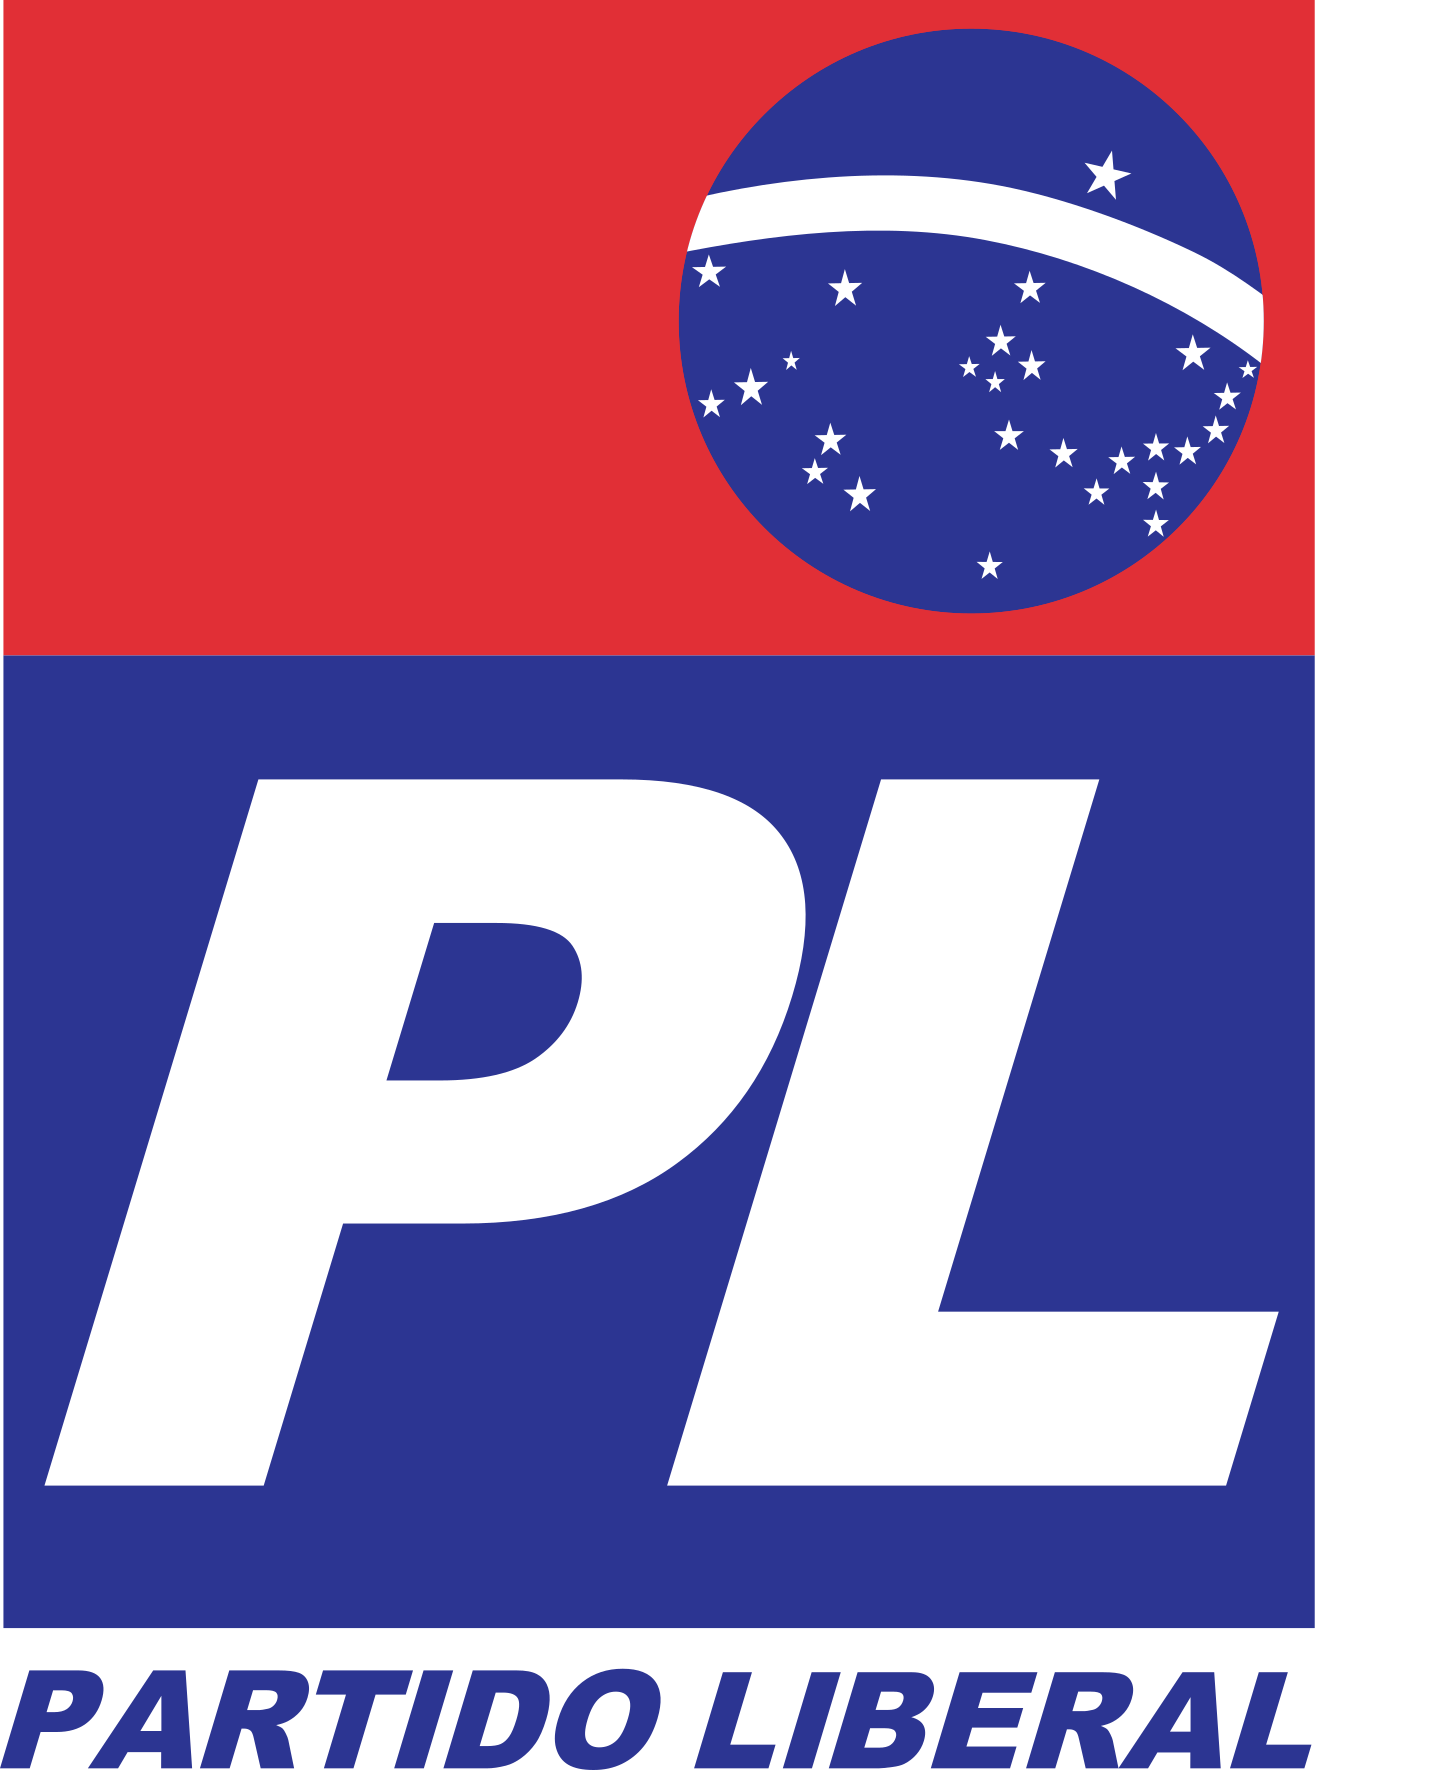 pl partido liberal logo 2 - PL Partido Liberal Logo